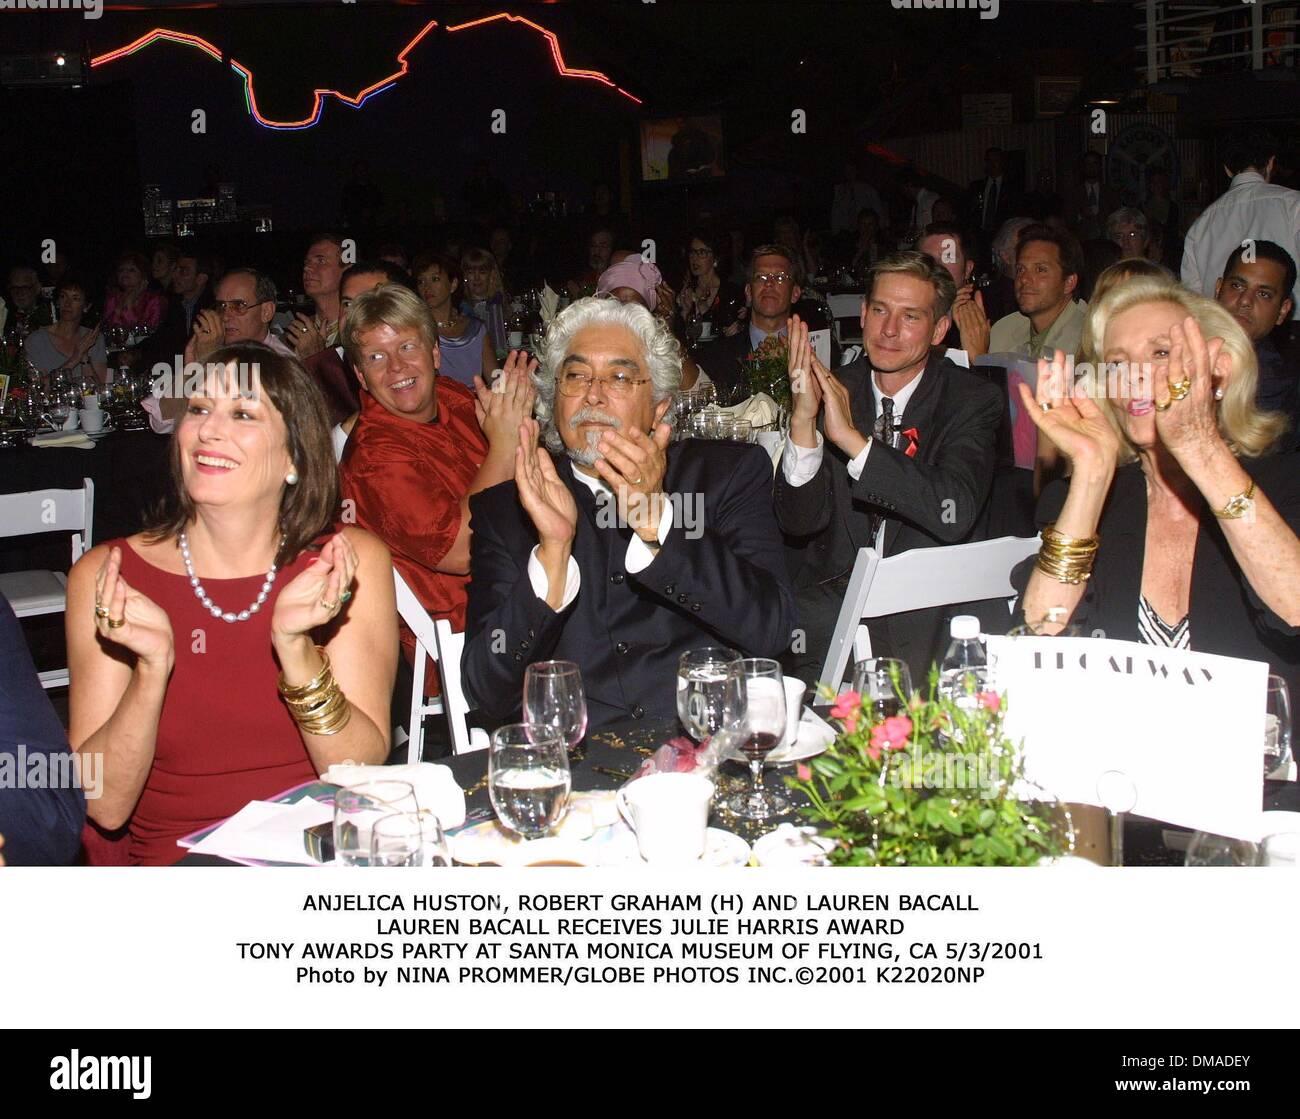 june 3, 2001 - anjelica huston, robert graham (h) and lauren stock